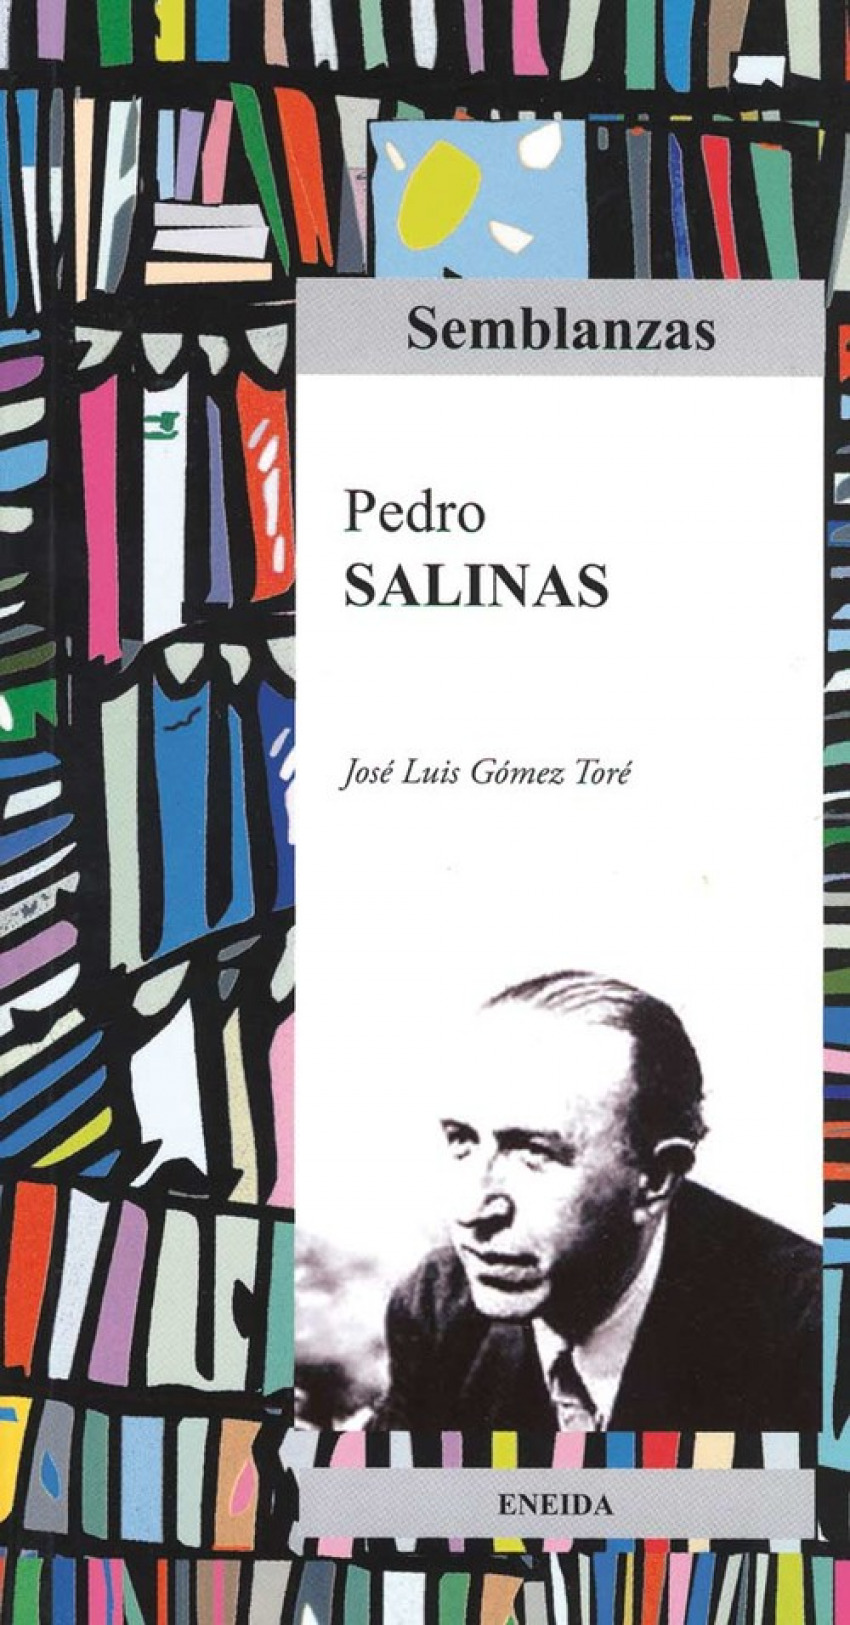 Pedro Salinas Biografía literaria - Gómez Toré, José Luis